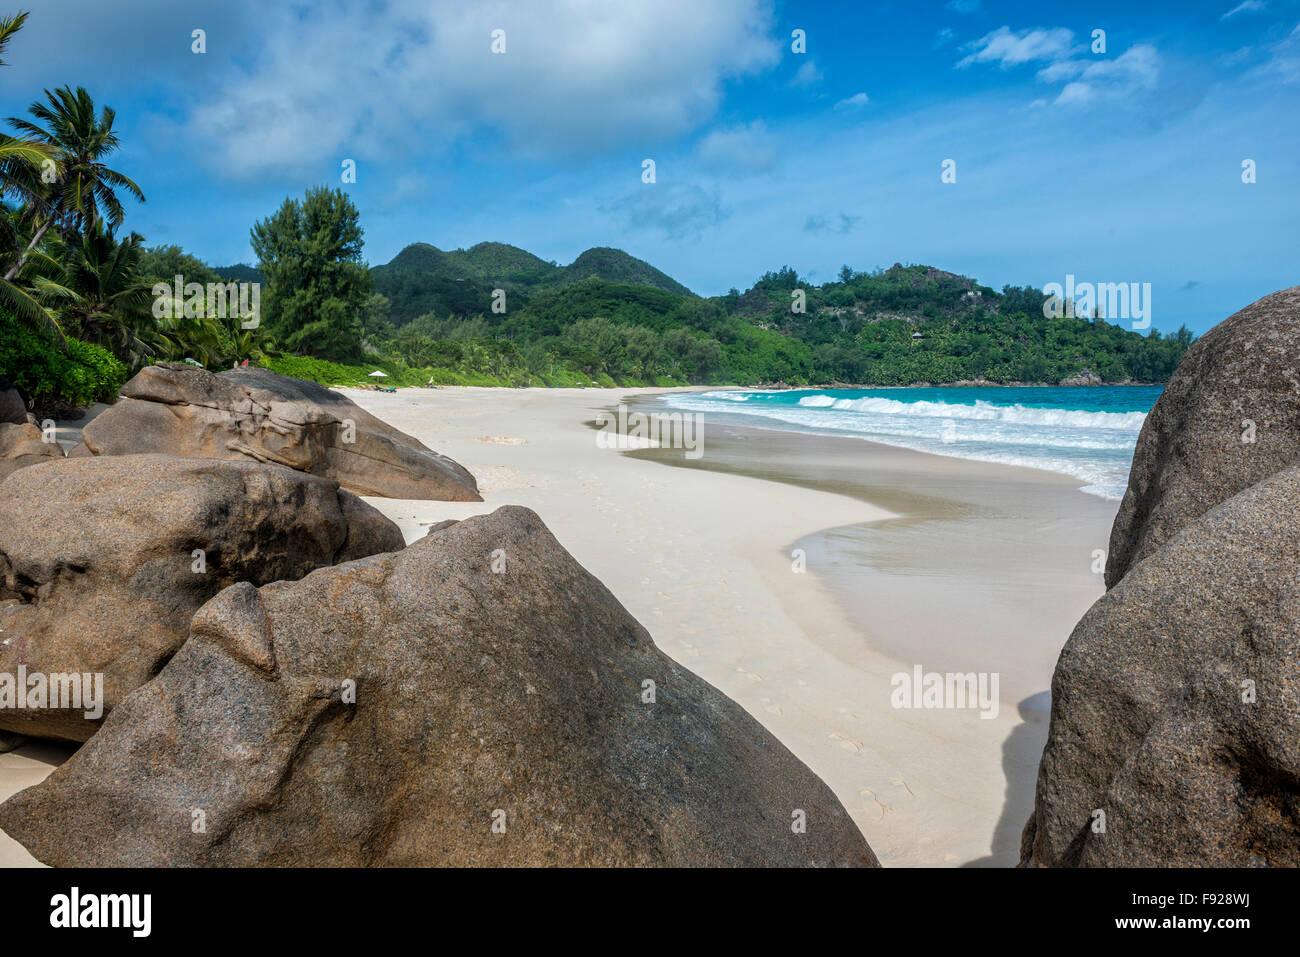 Anse Intendance, Mahe Island, The Seychelles - Stock Image